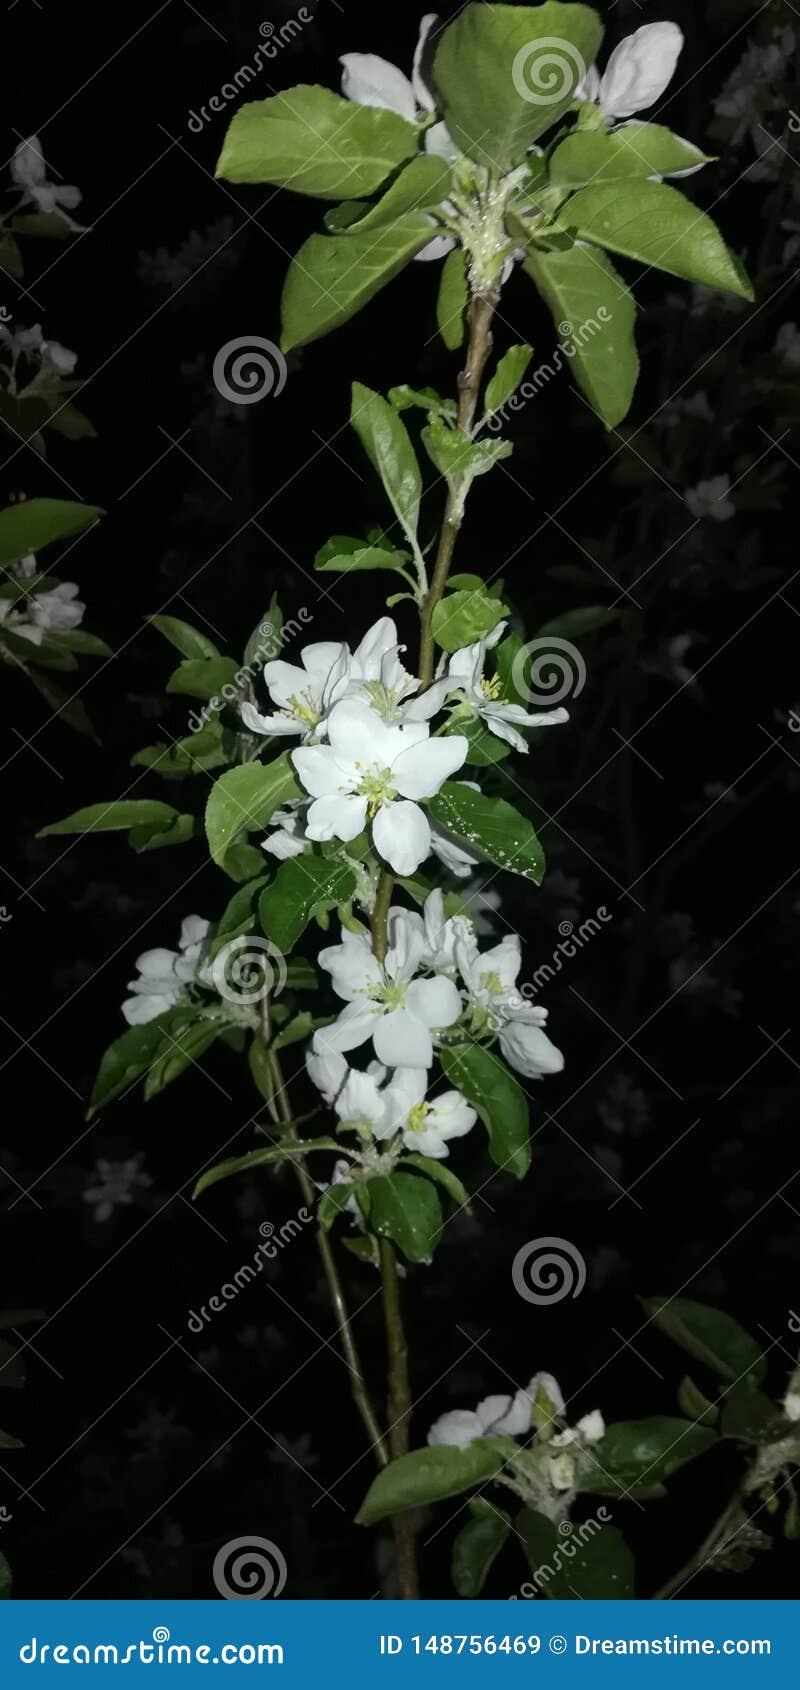 Blooming Apple tree at night